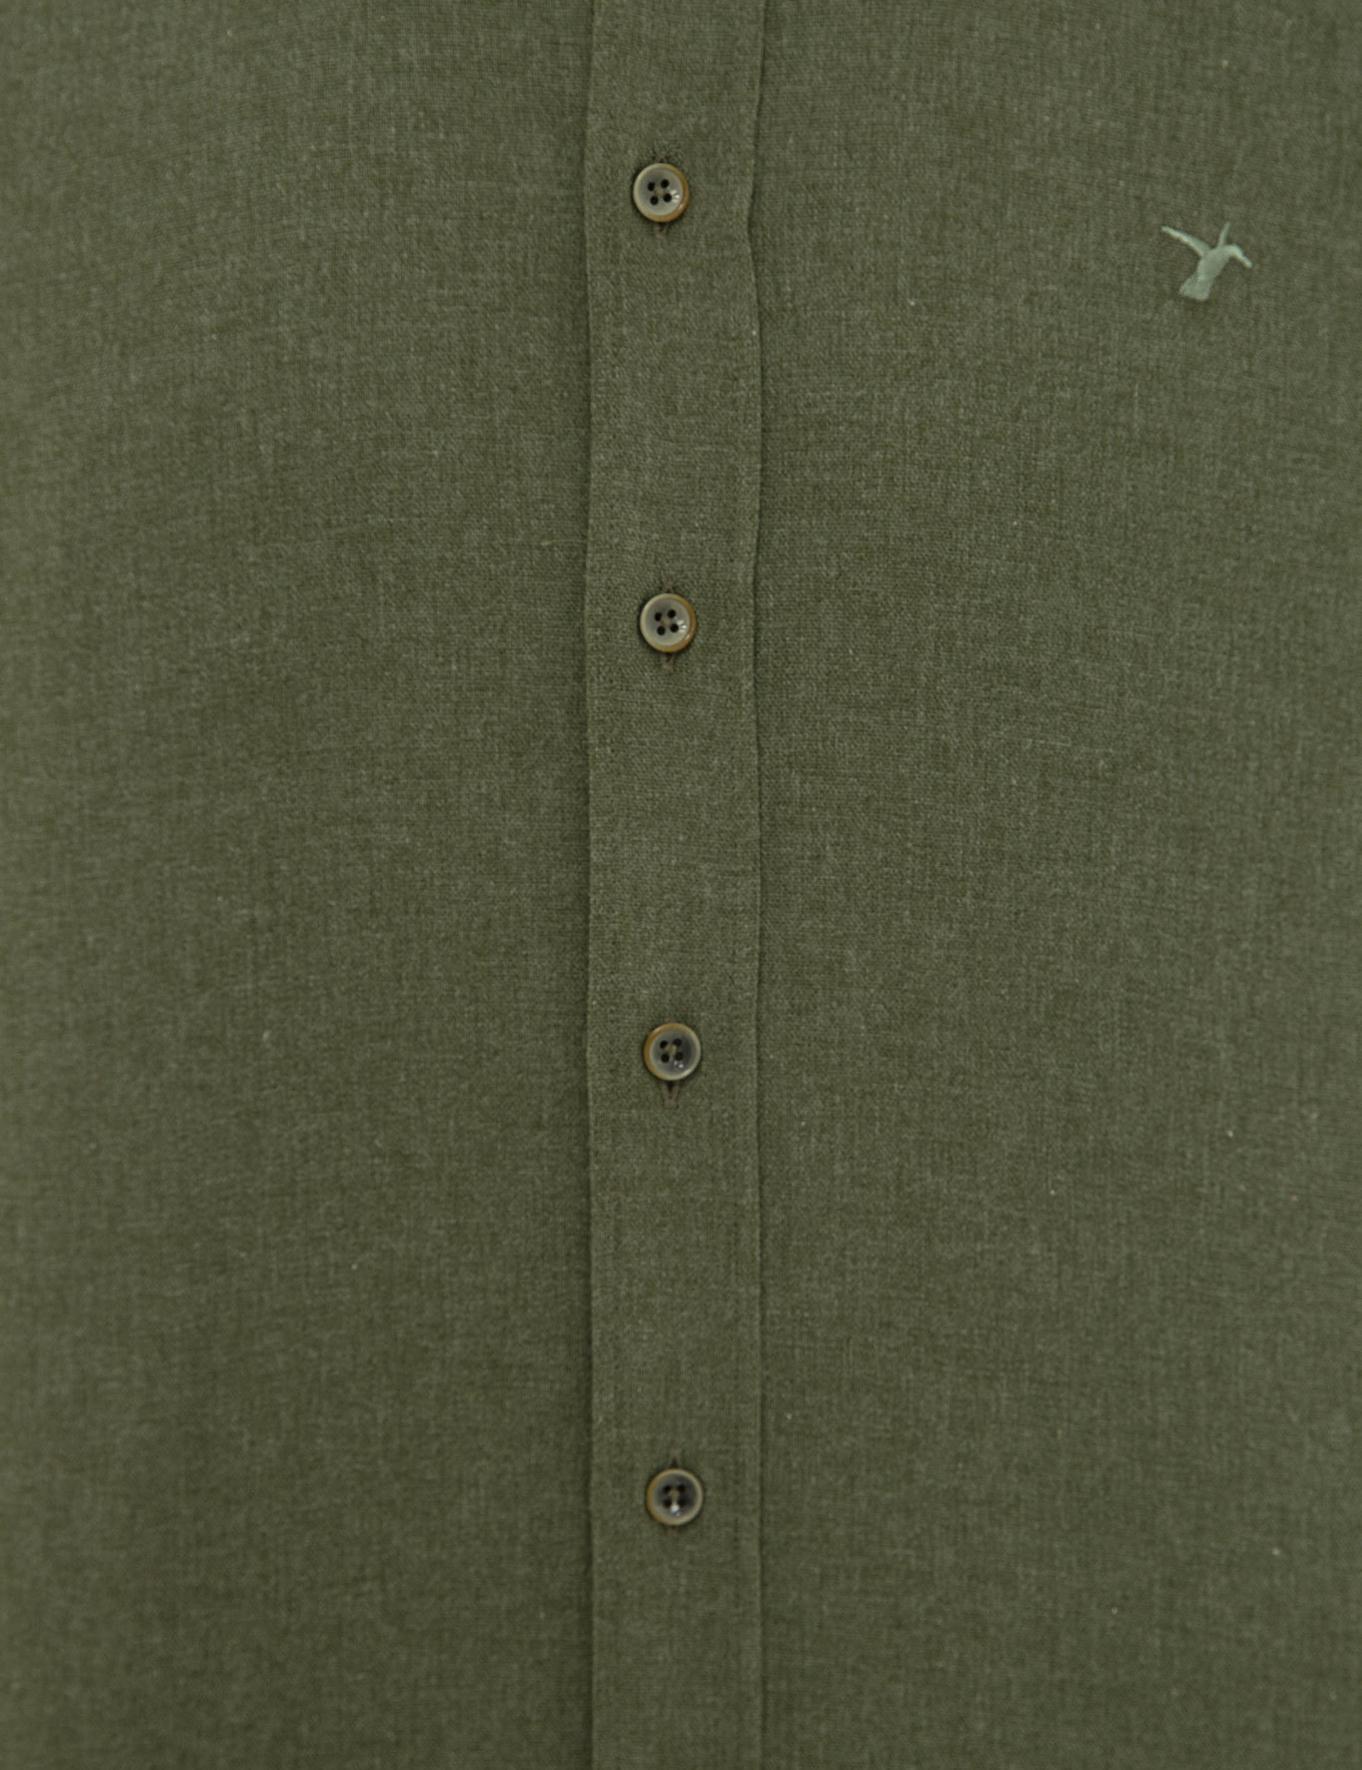 Koyu Yeşil Slim Fit Gömlek - 50227042193